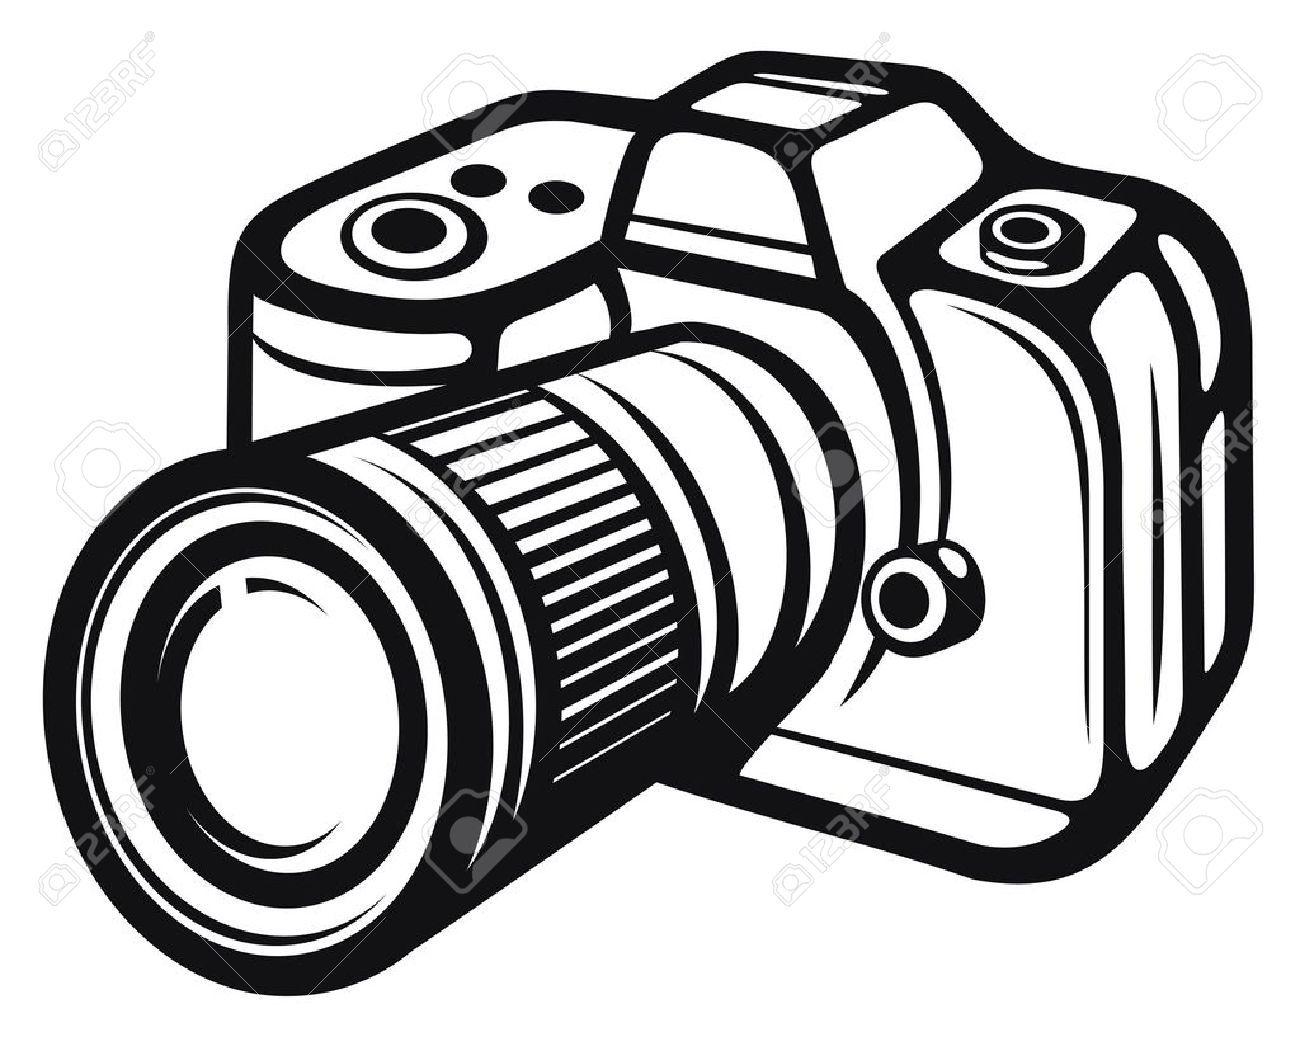 Compact Digital Camera Digital Photo Camera Compact Digital Camera Camera Clip Art Digital Camera Photo